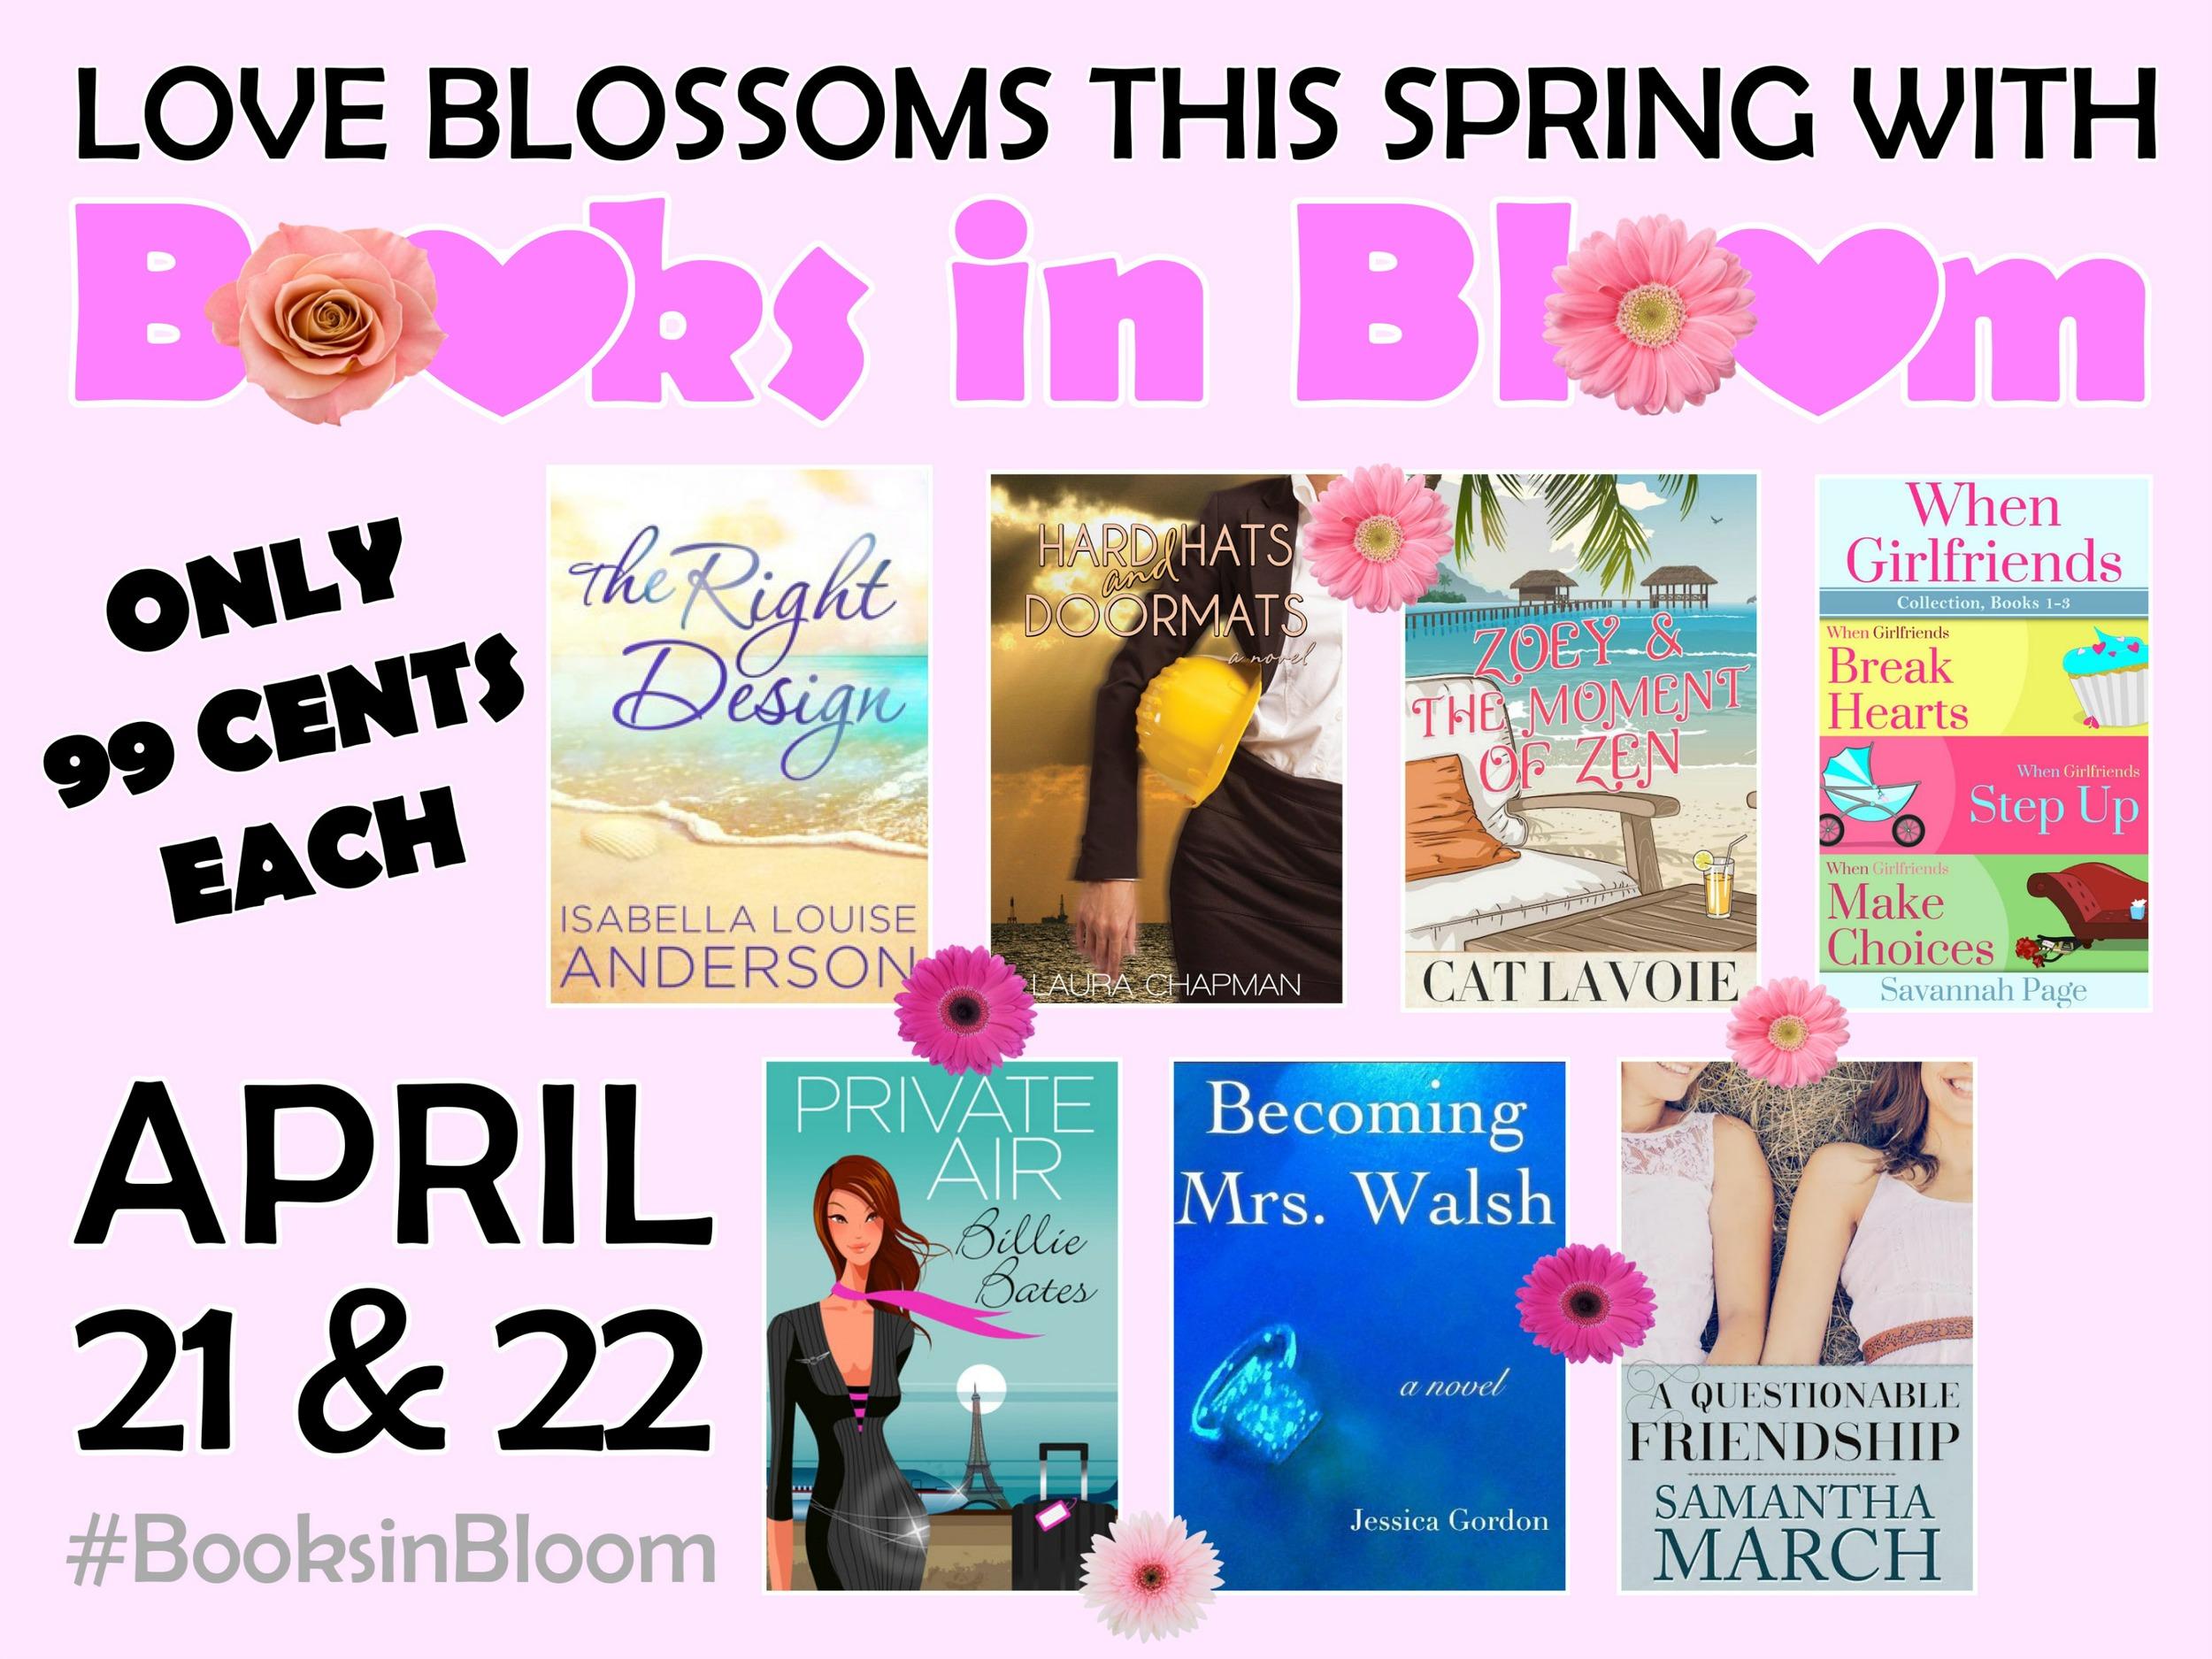 Books In Bloom -Savannah Page